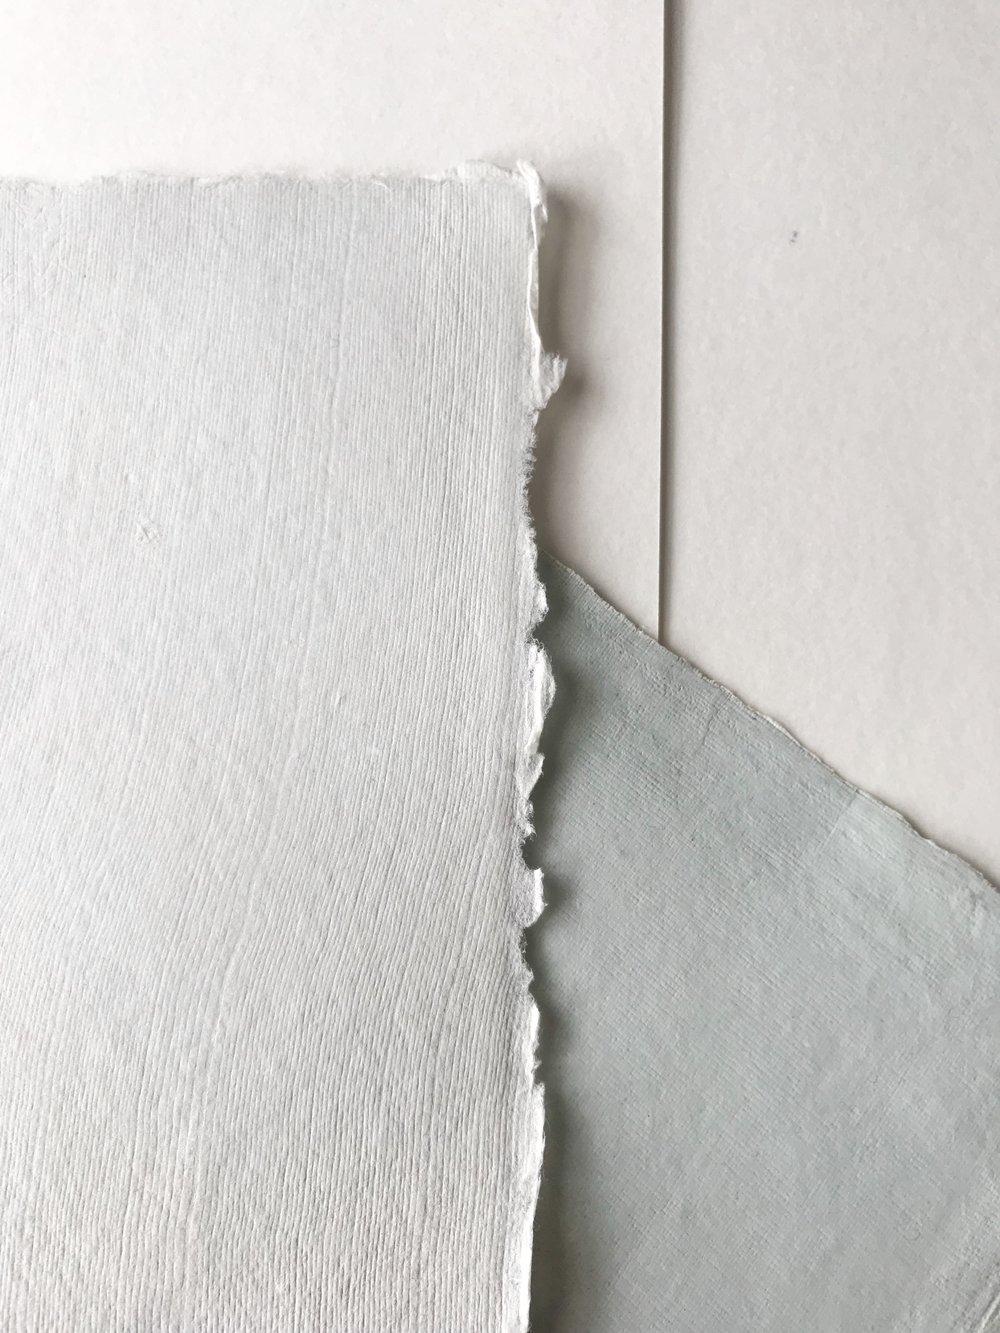 Cool tone handmade paper